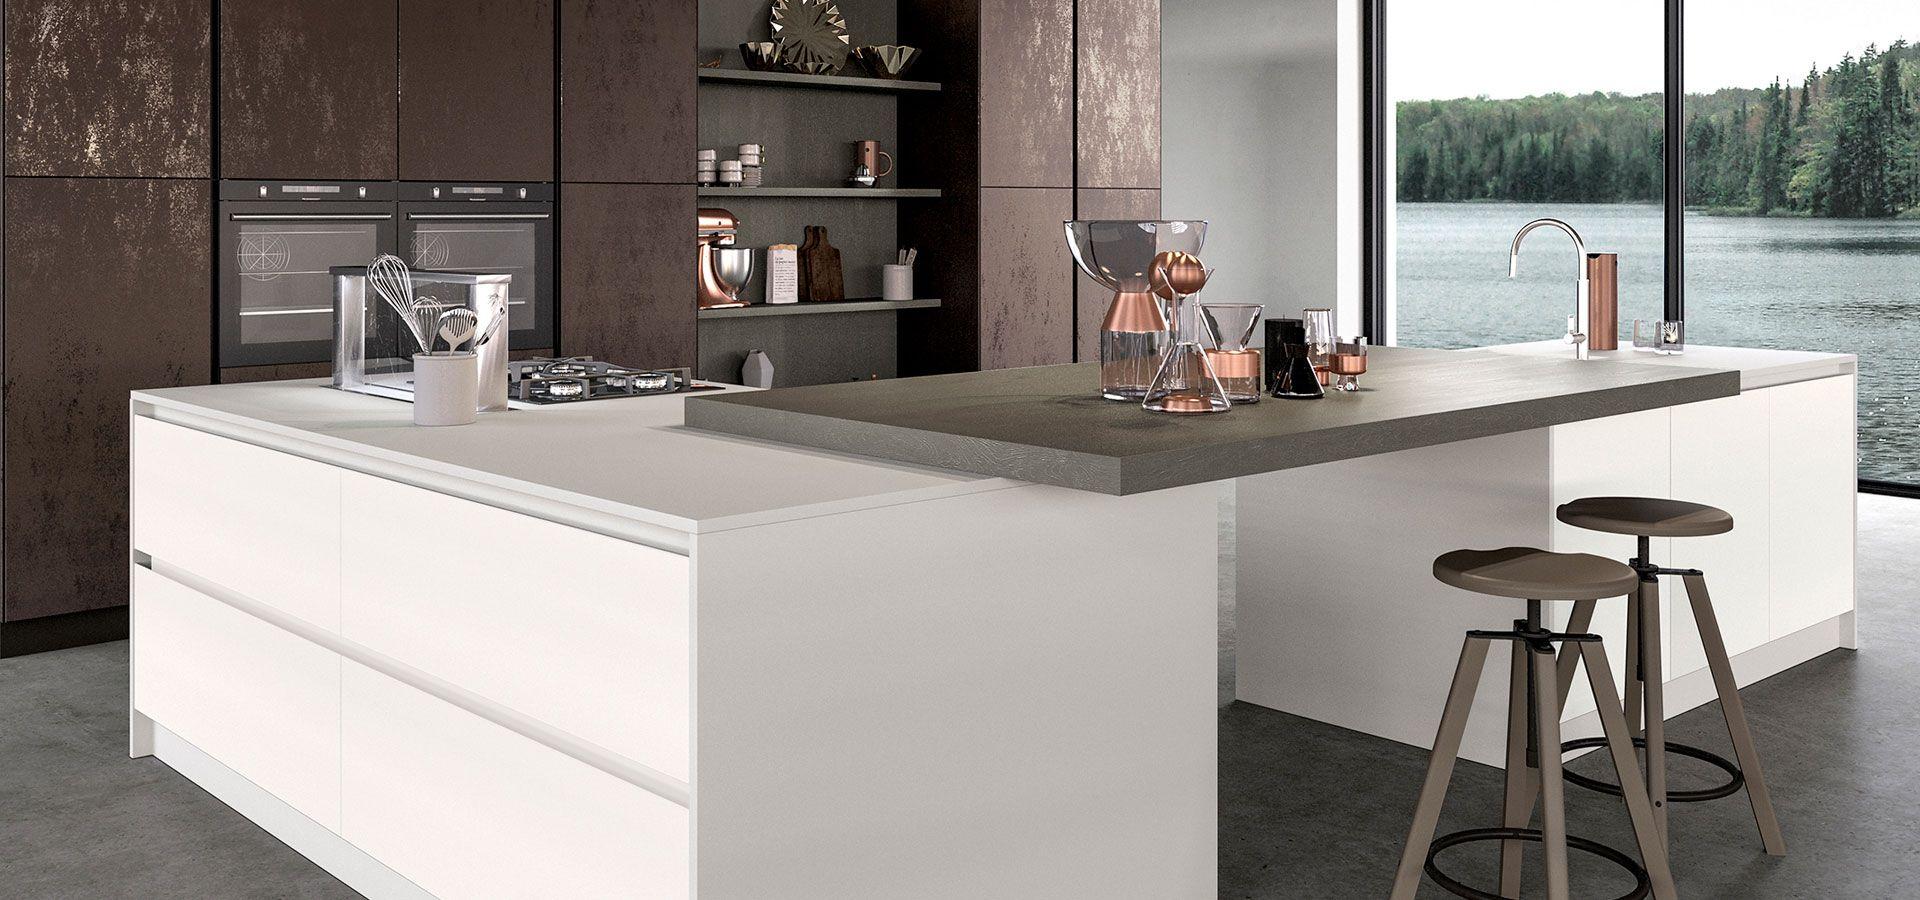 Cucina moderna design ante in vetro lucido opaco glass arredo3 interiors kitchens - Cucina moderna design ...